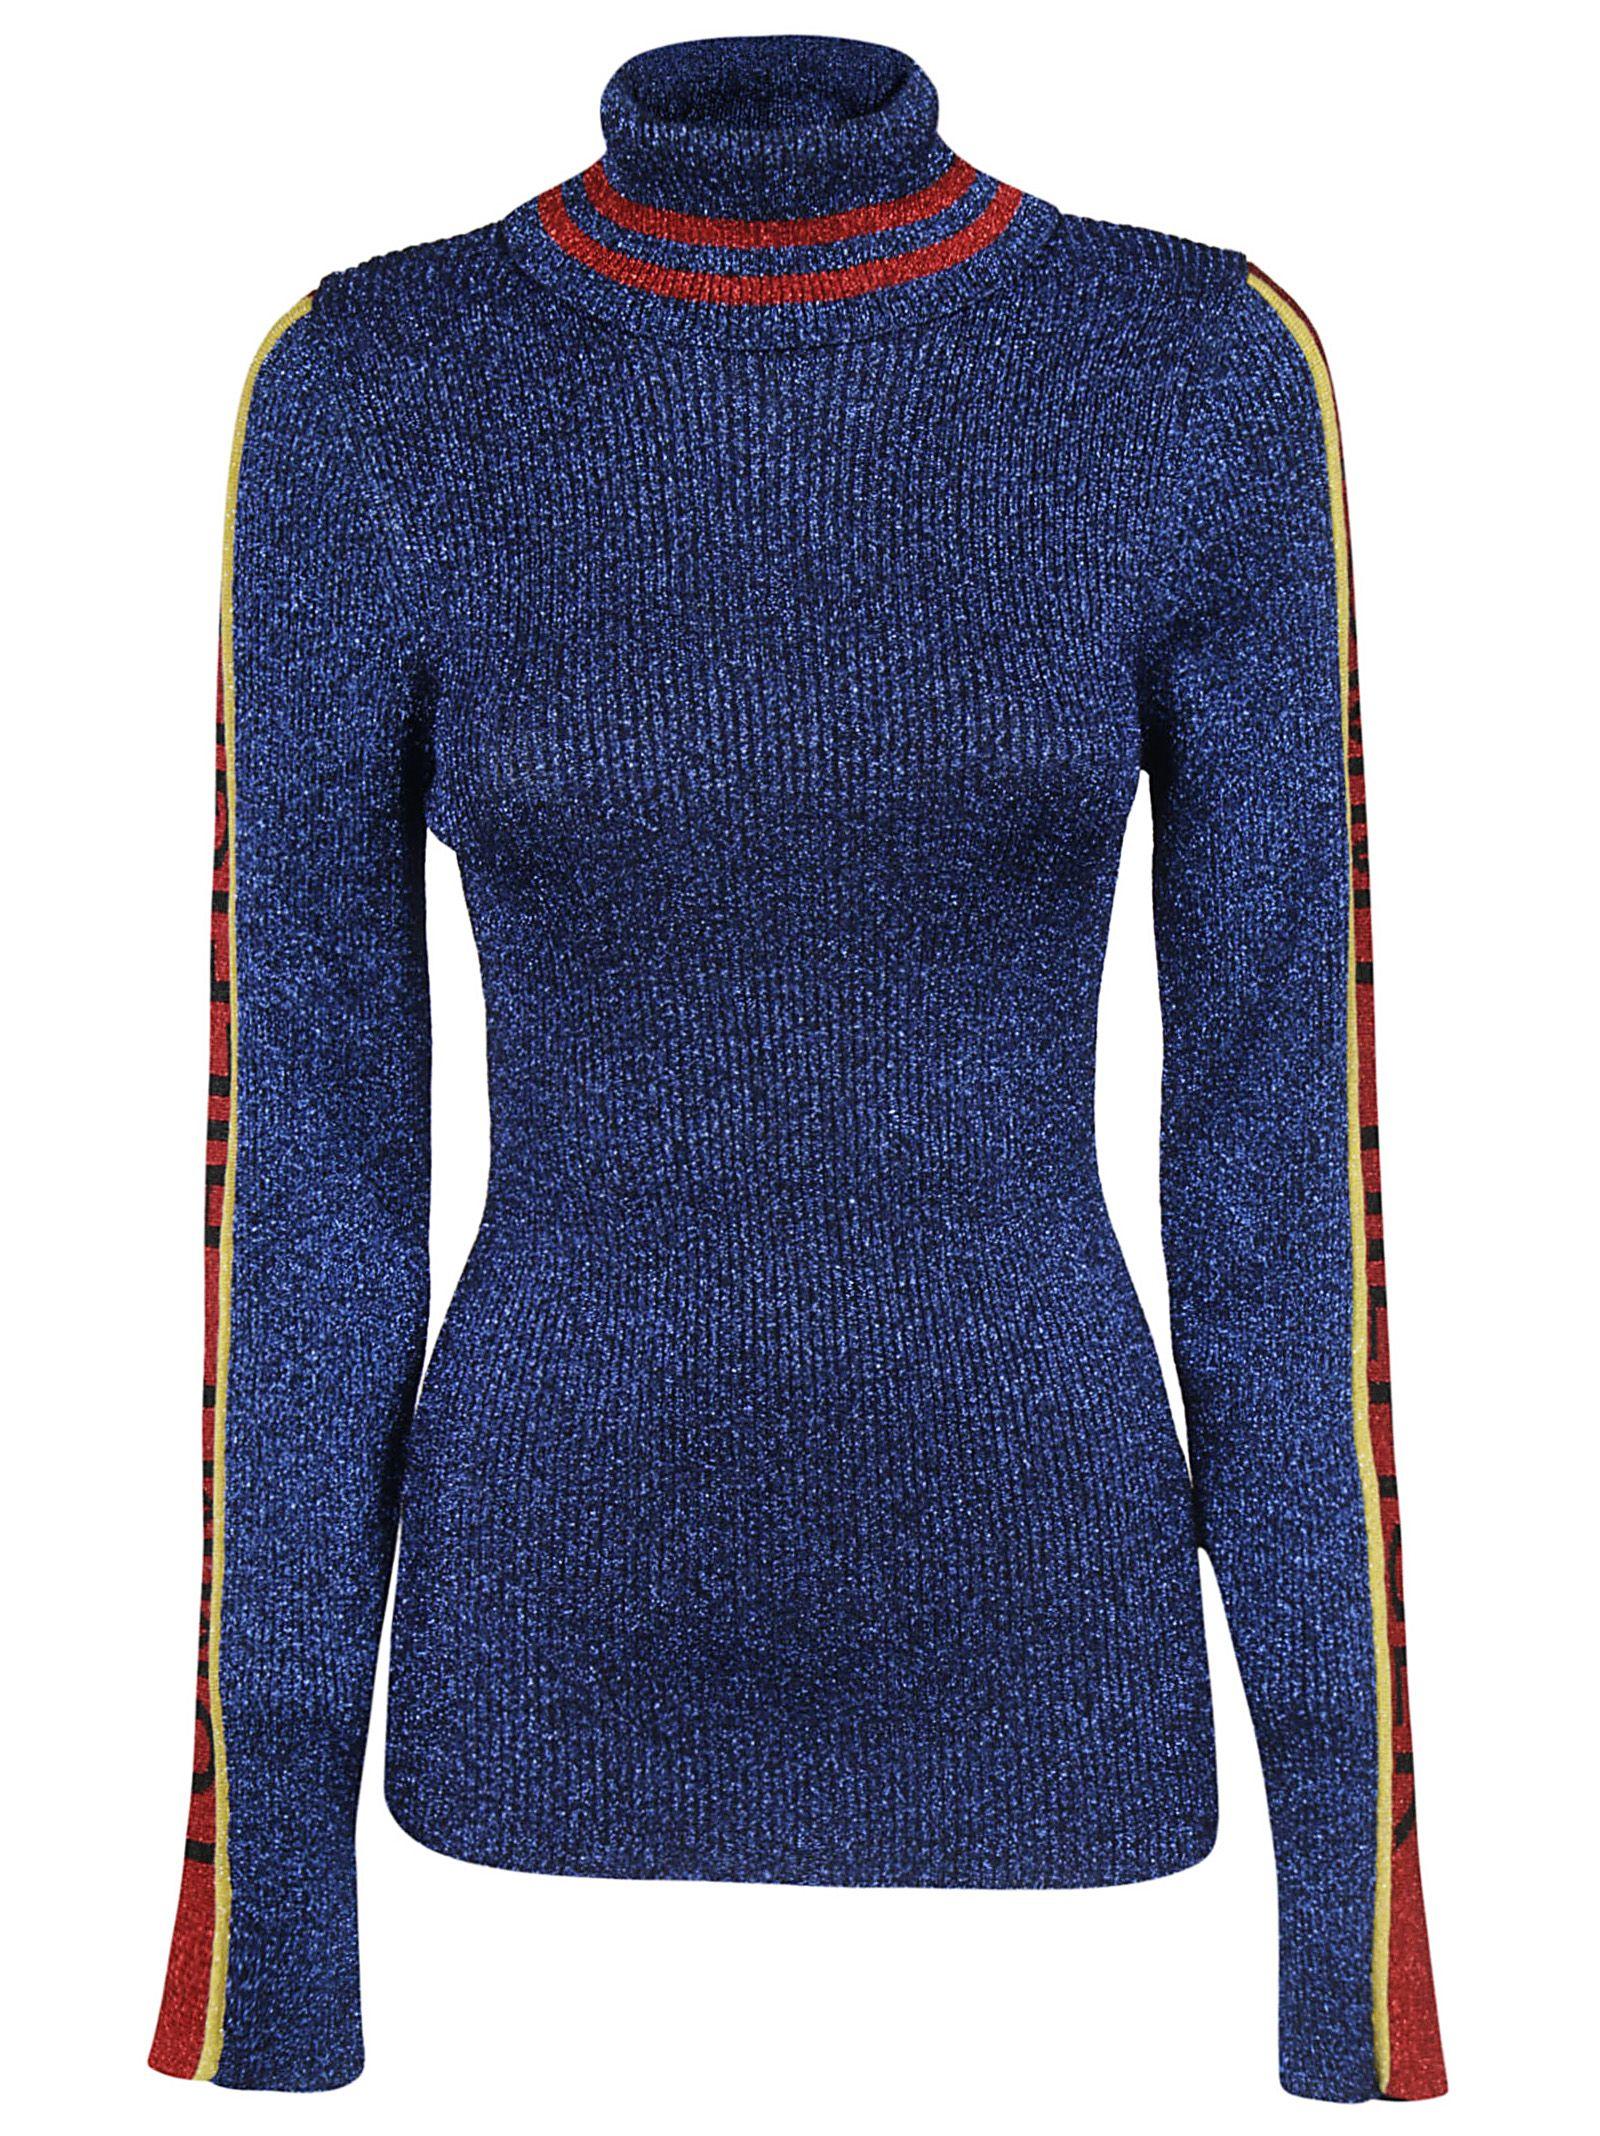 80e5cf53 Tommy Hilfiger Tommy Hilfiger Contrast Glitter Sweater - Basic ...